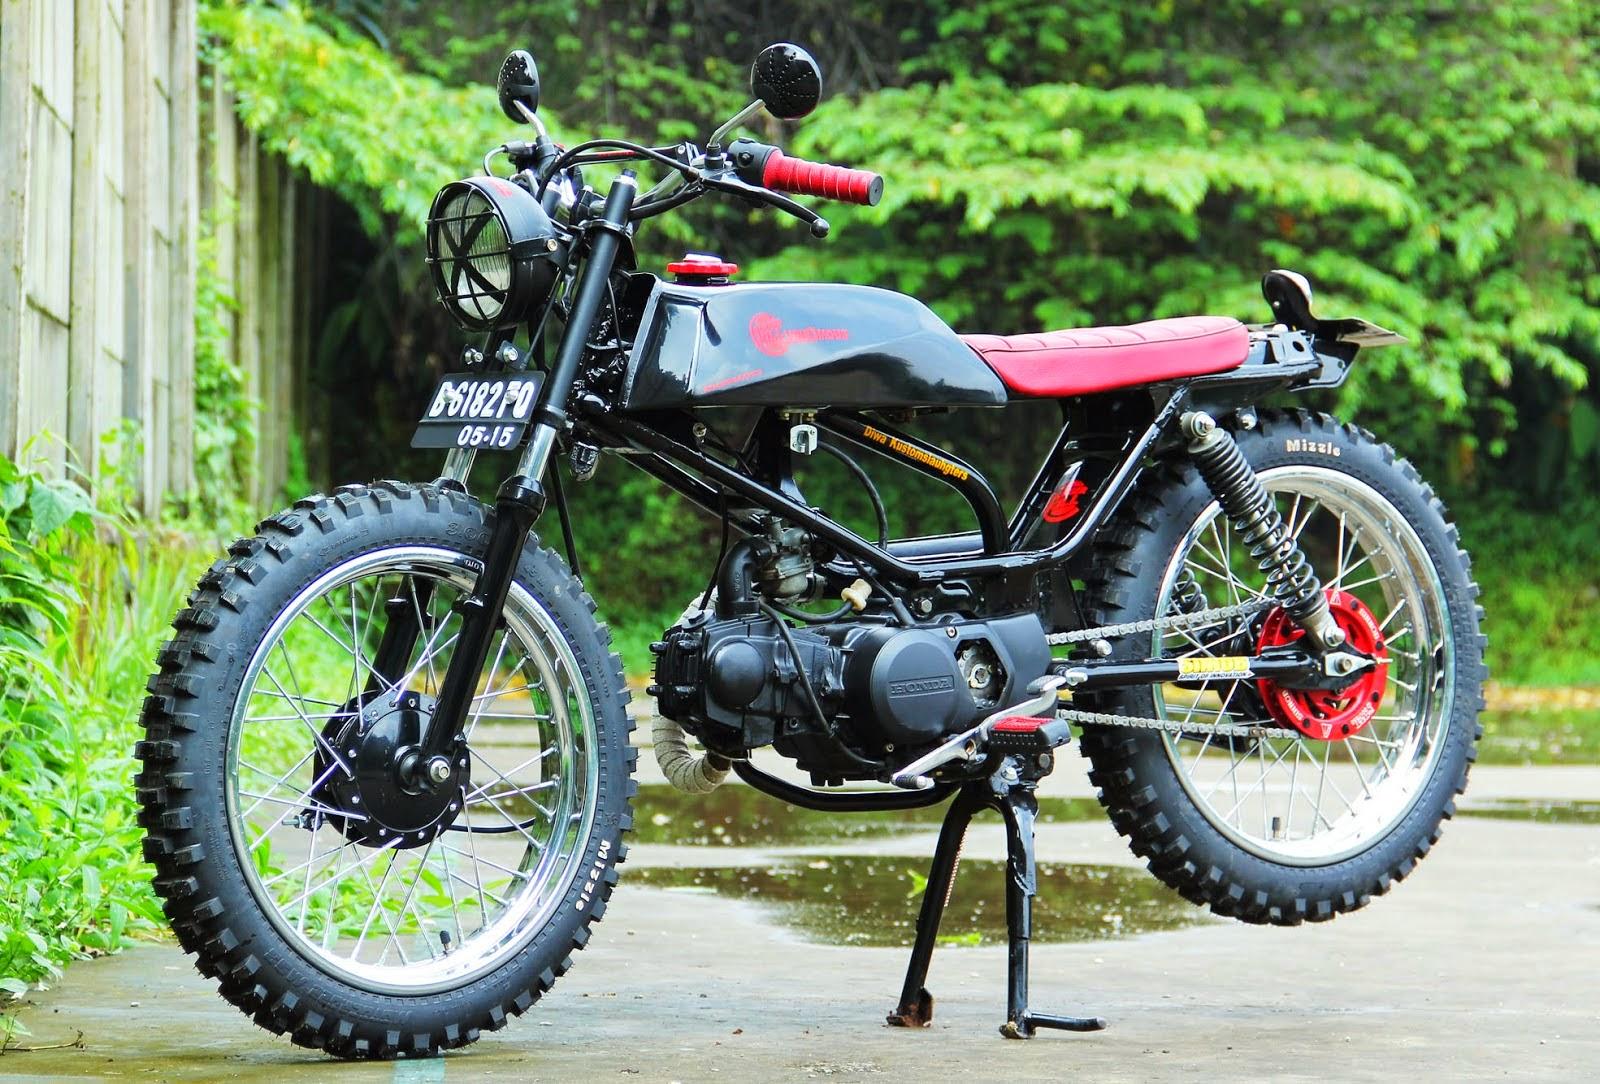 Kumpulan Foto Modifikasi Motor Honda Cbr Terbaru Tales Modif